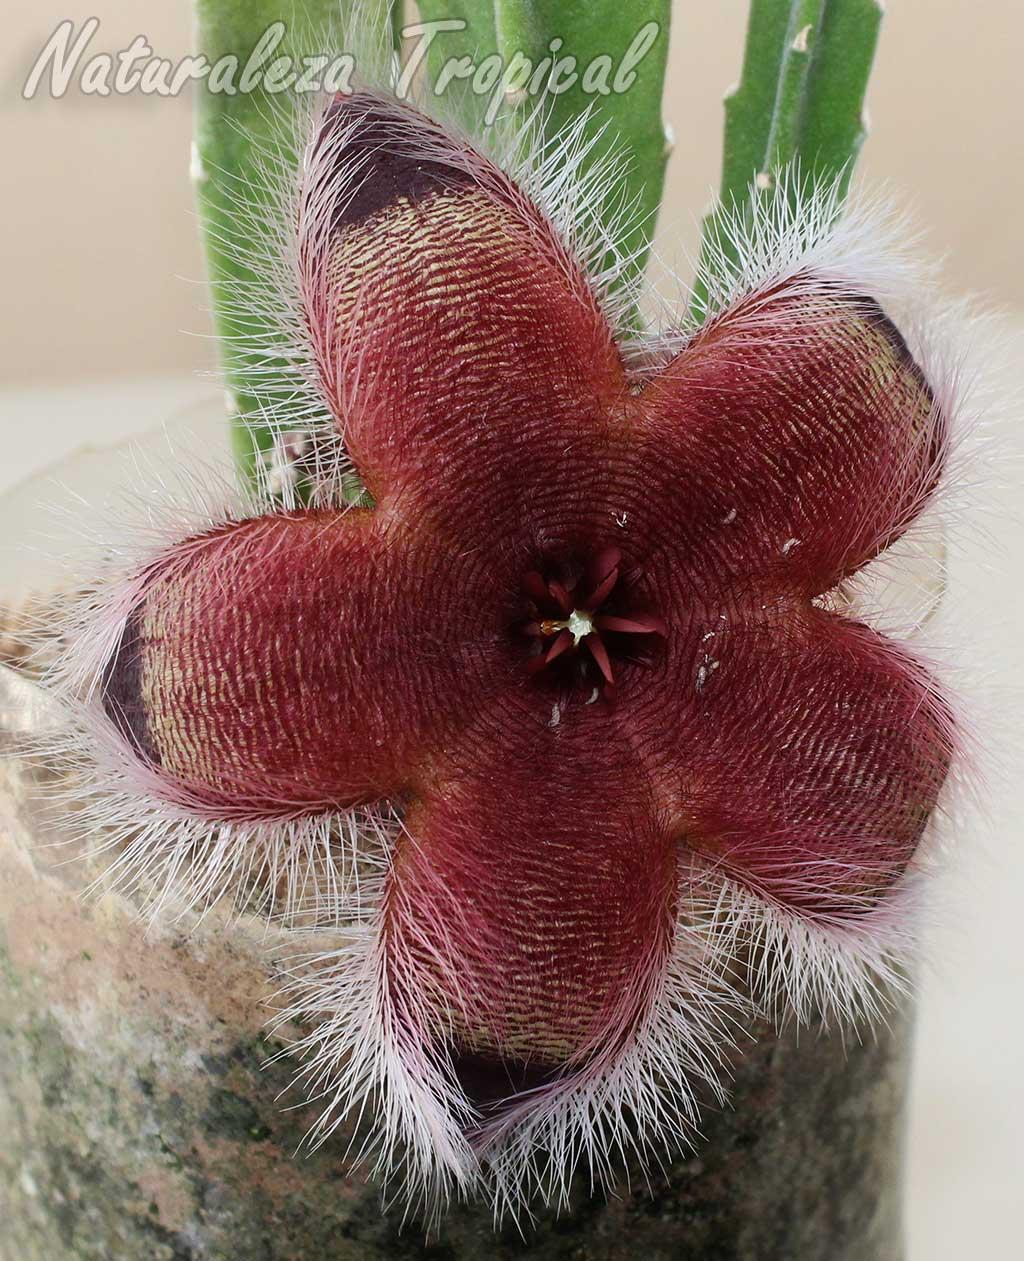 Otra foto de la hermosa flor de la planta suculenta Stapelia grandiflora var. ambigua